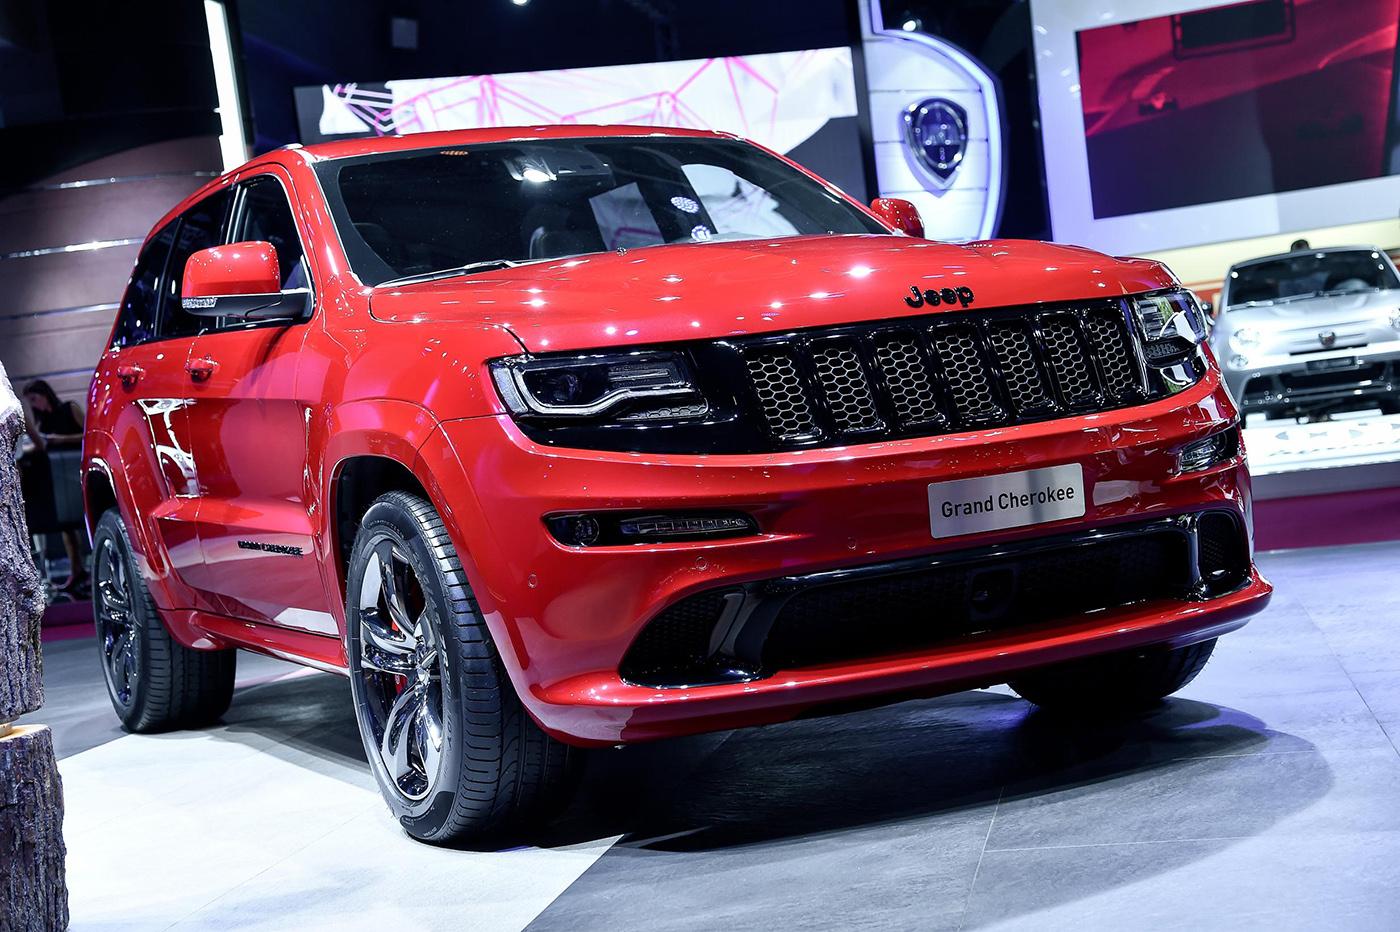 paris 2014 jeep grand cherokee srt 8 red vapor. Black Bedroom Furniture Sets. Home Design Ideas